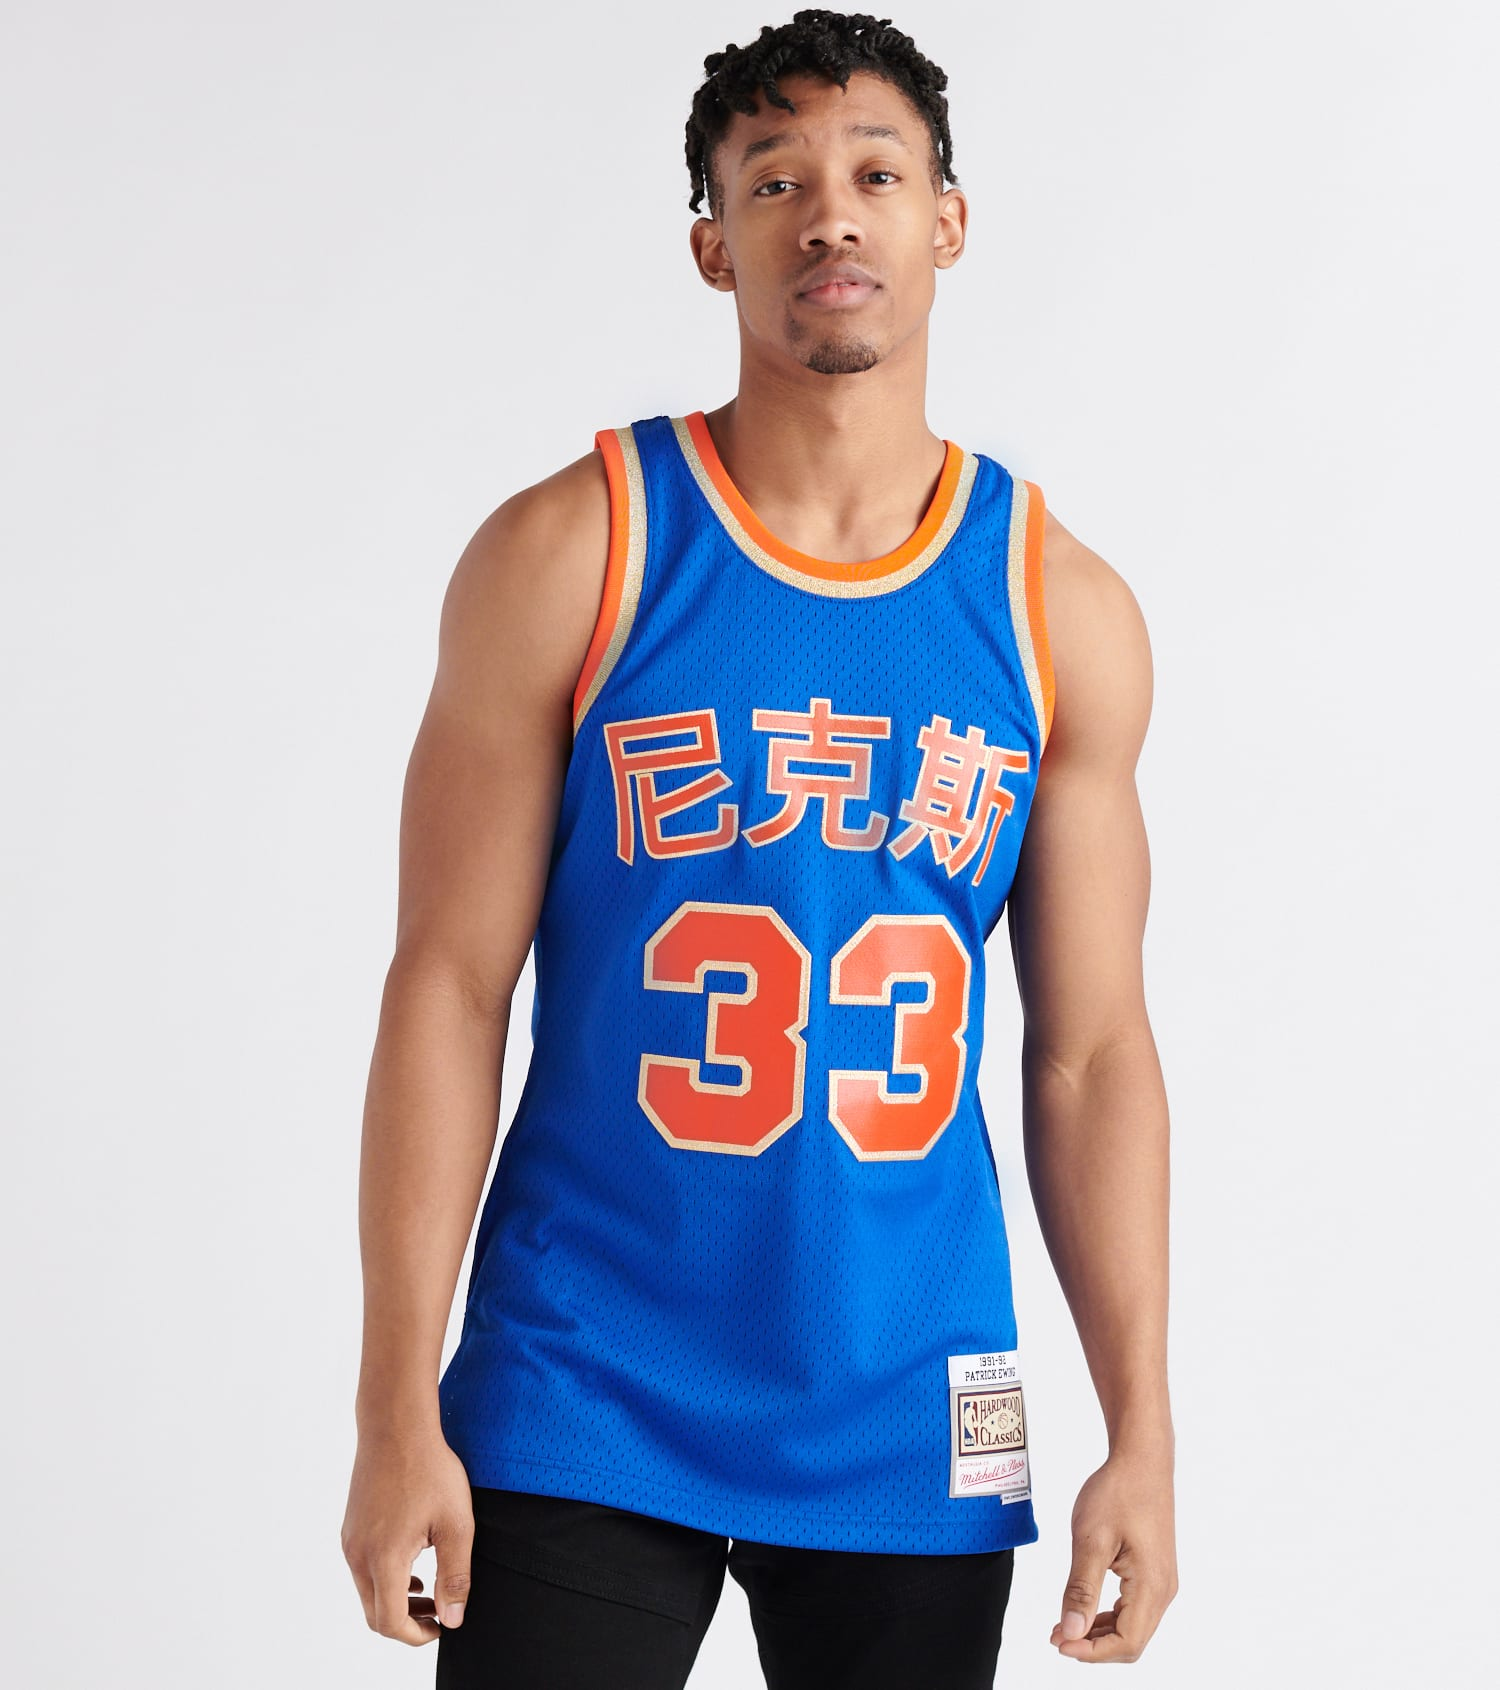 hot sale online 81222 cb89d New York Knicks Patrick Ewing Jersey